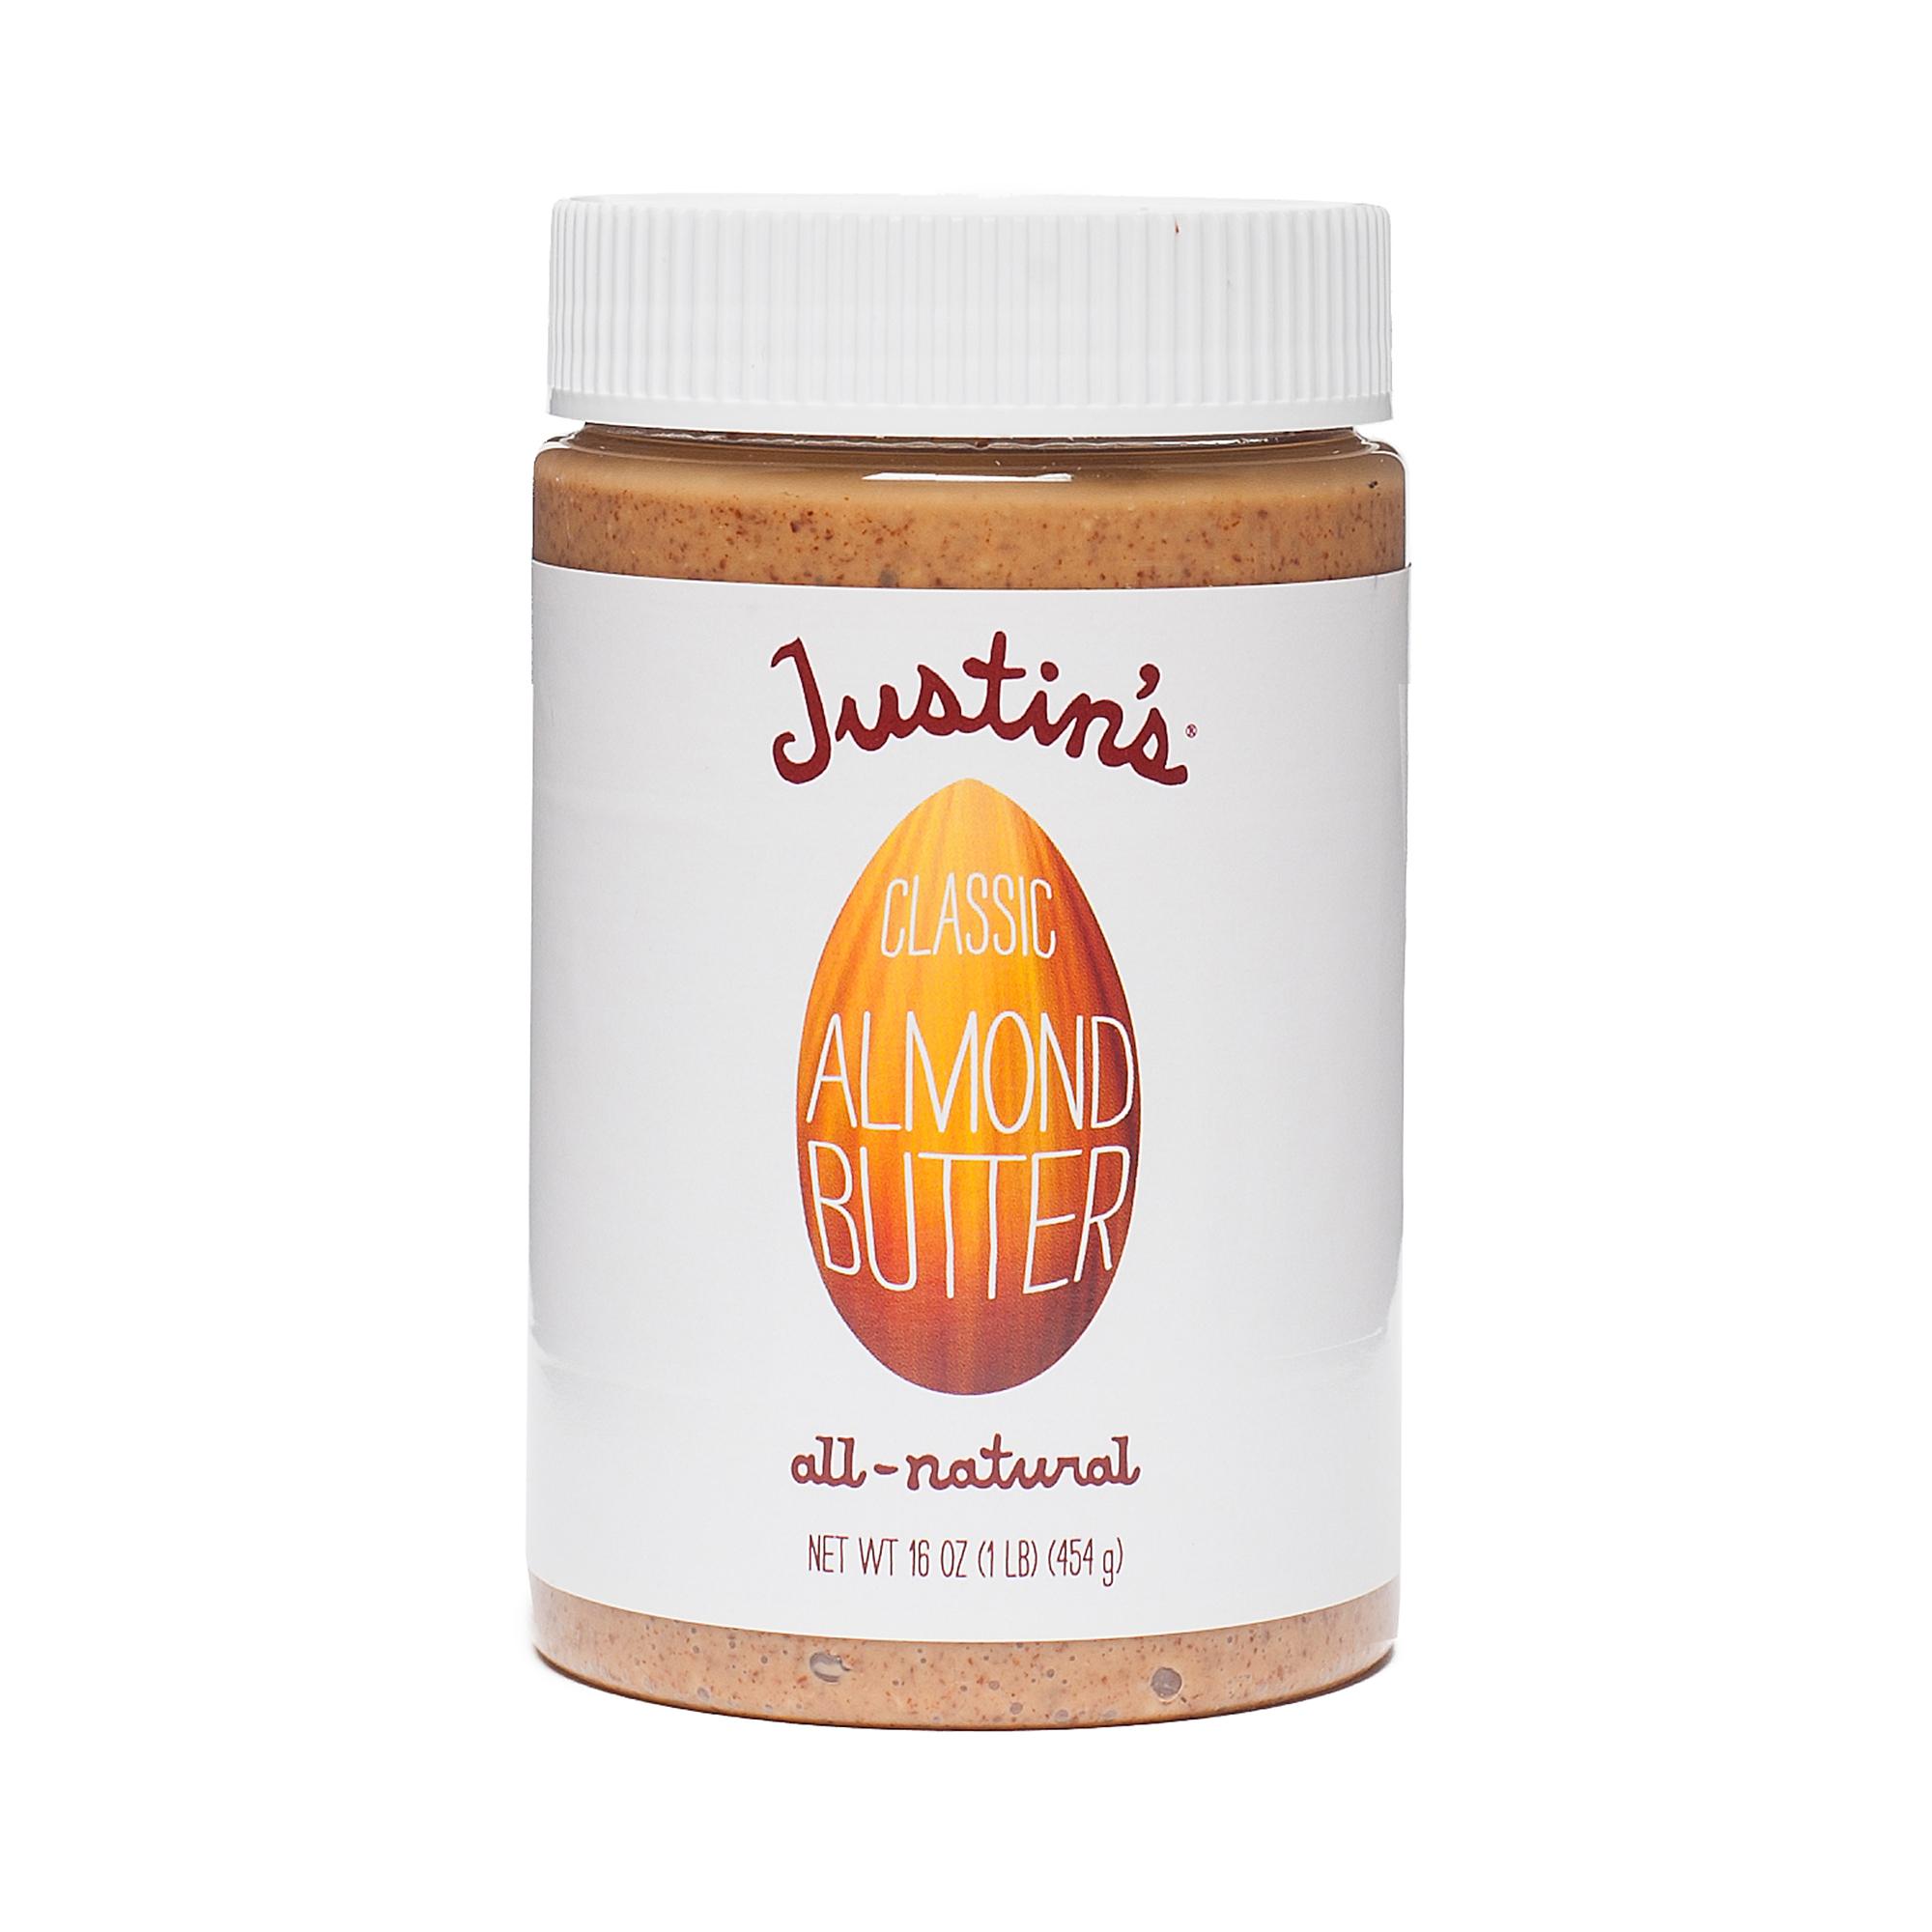 Justin's Classic Almond Butter 16 oz jar